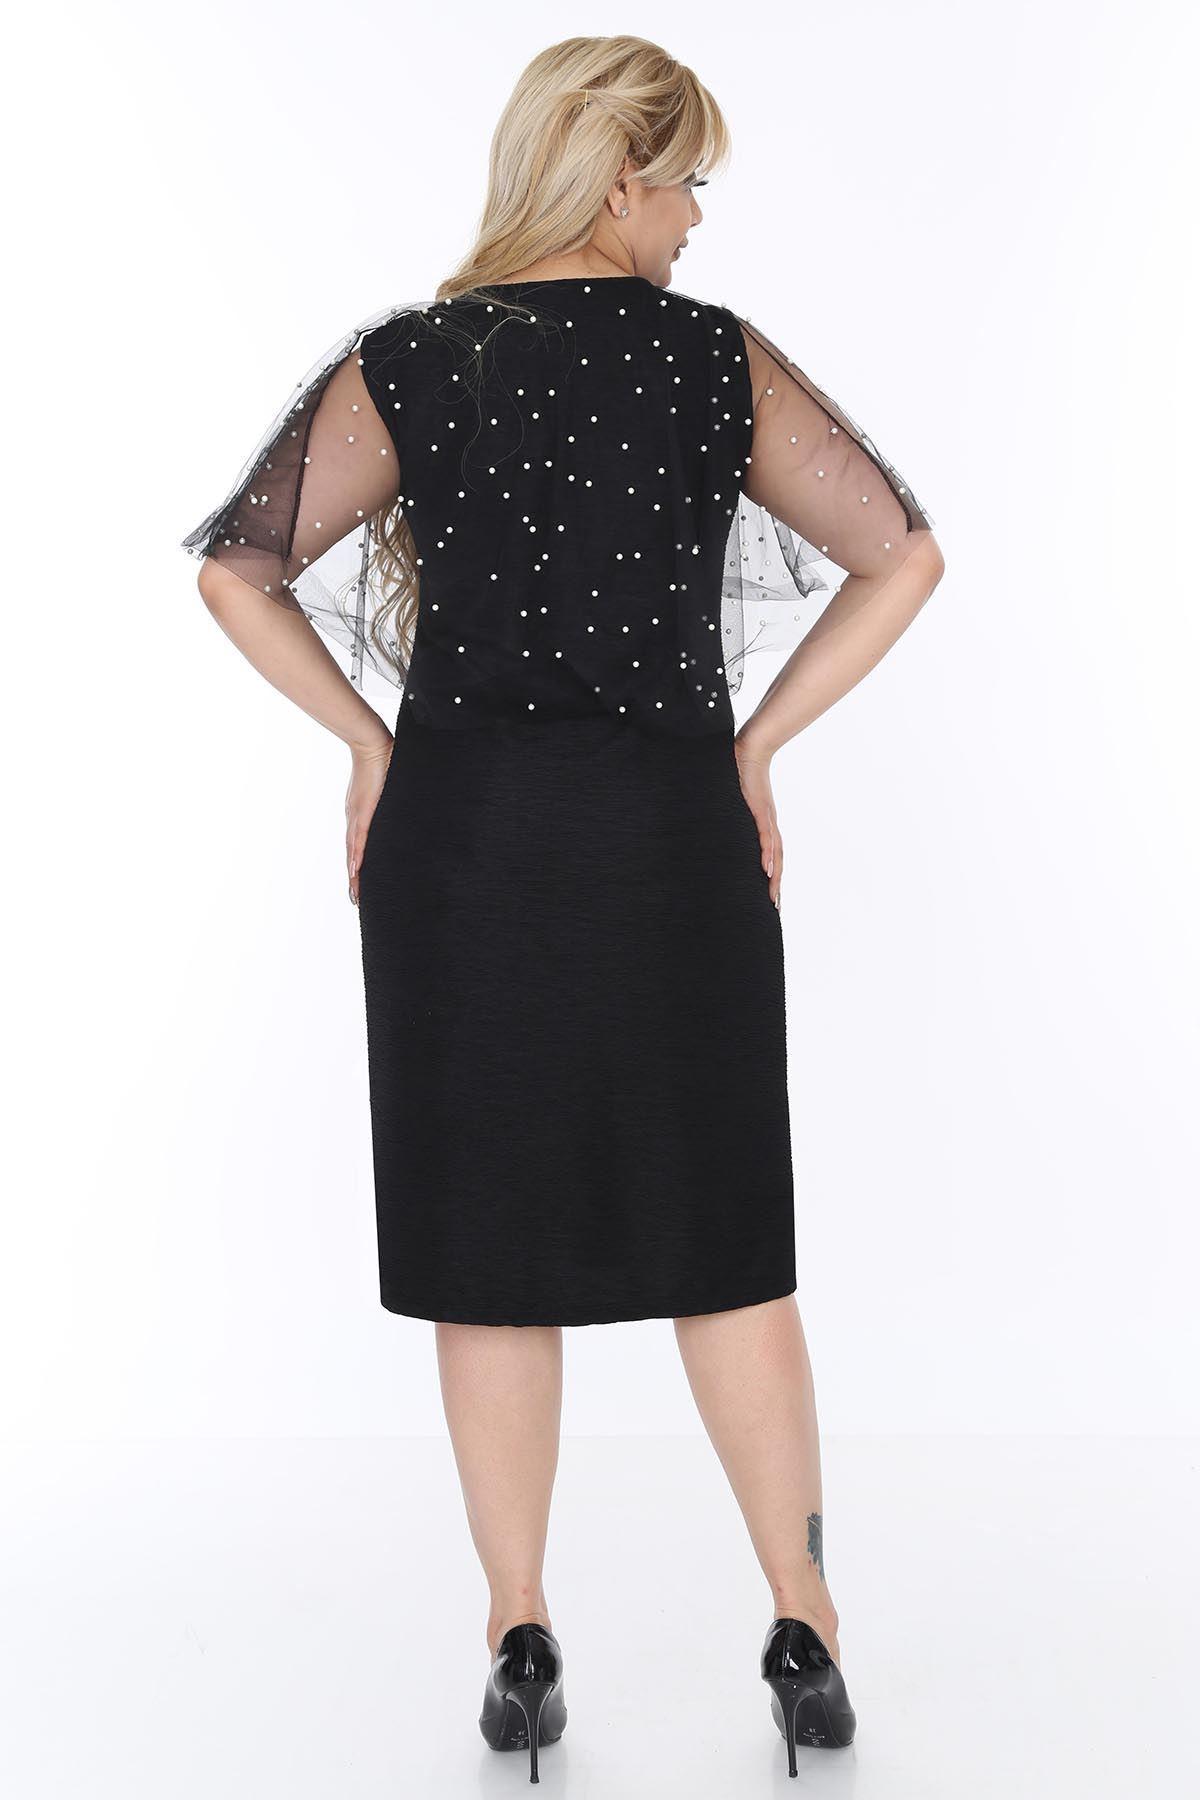 İncili Şallı Elbise 20L-0504